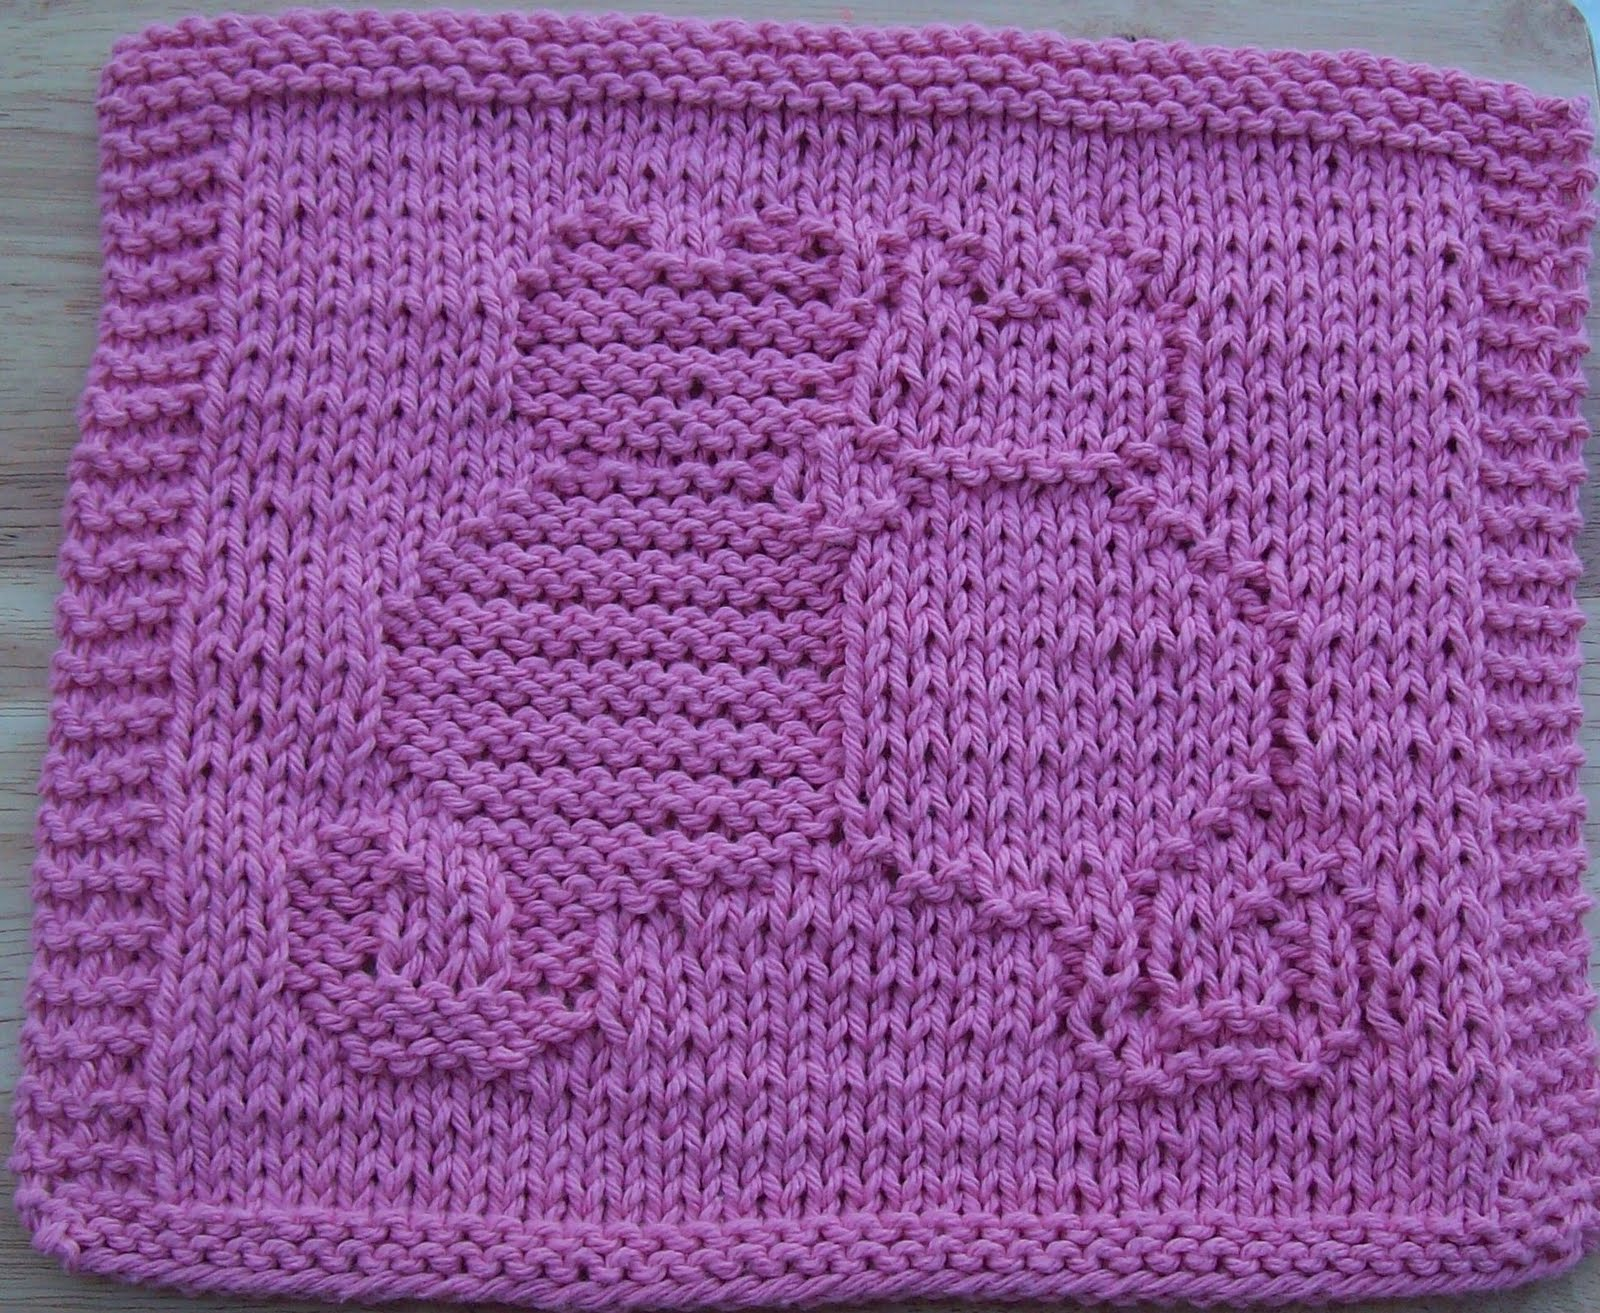 Free Dishcloths Knitting Patterns